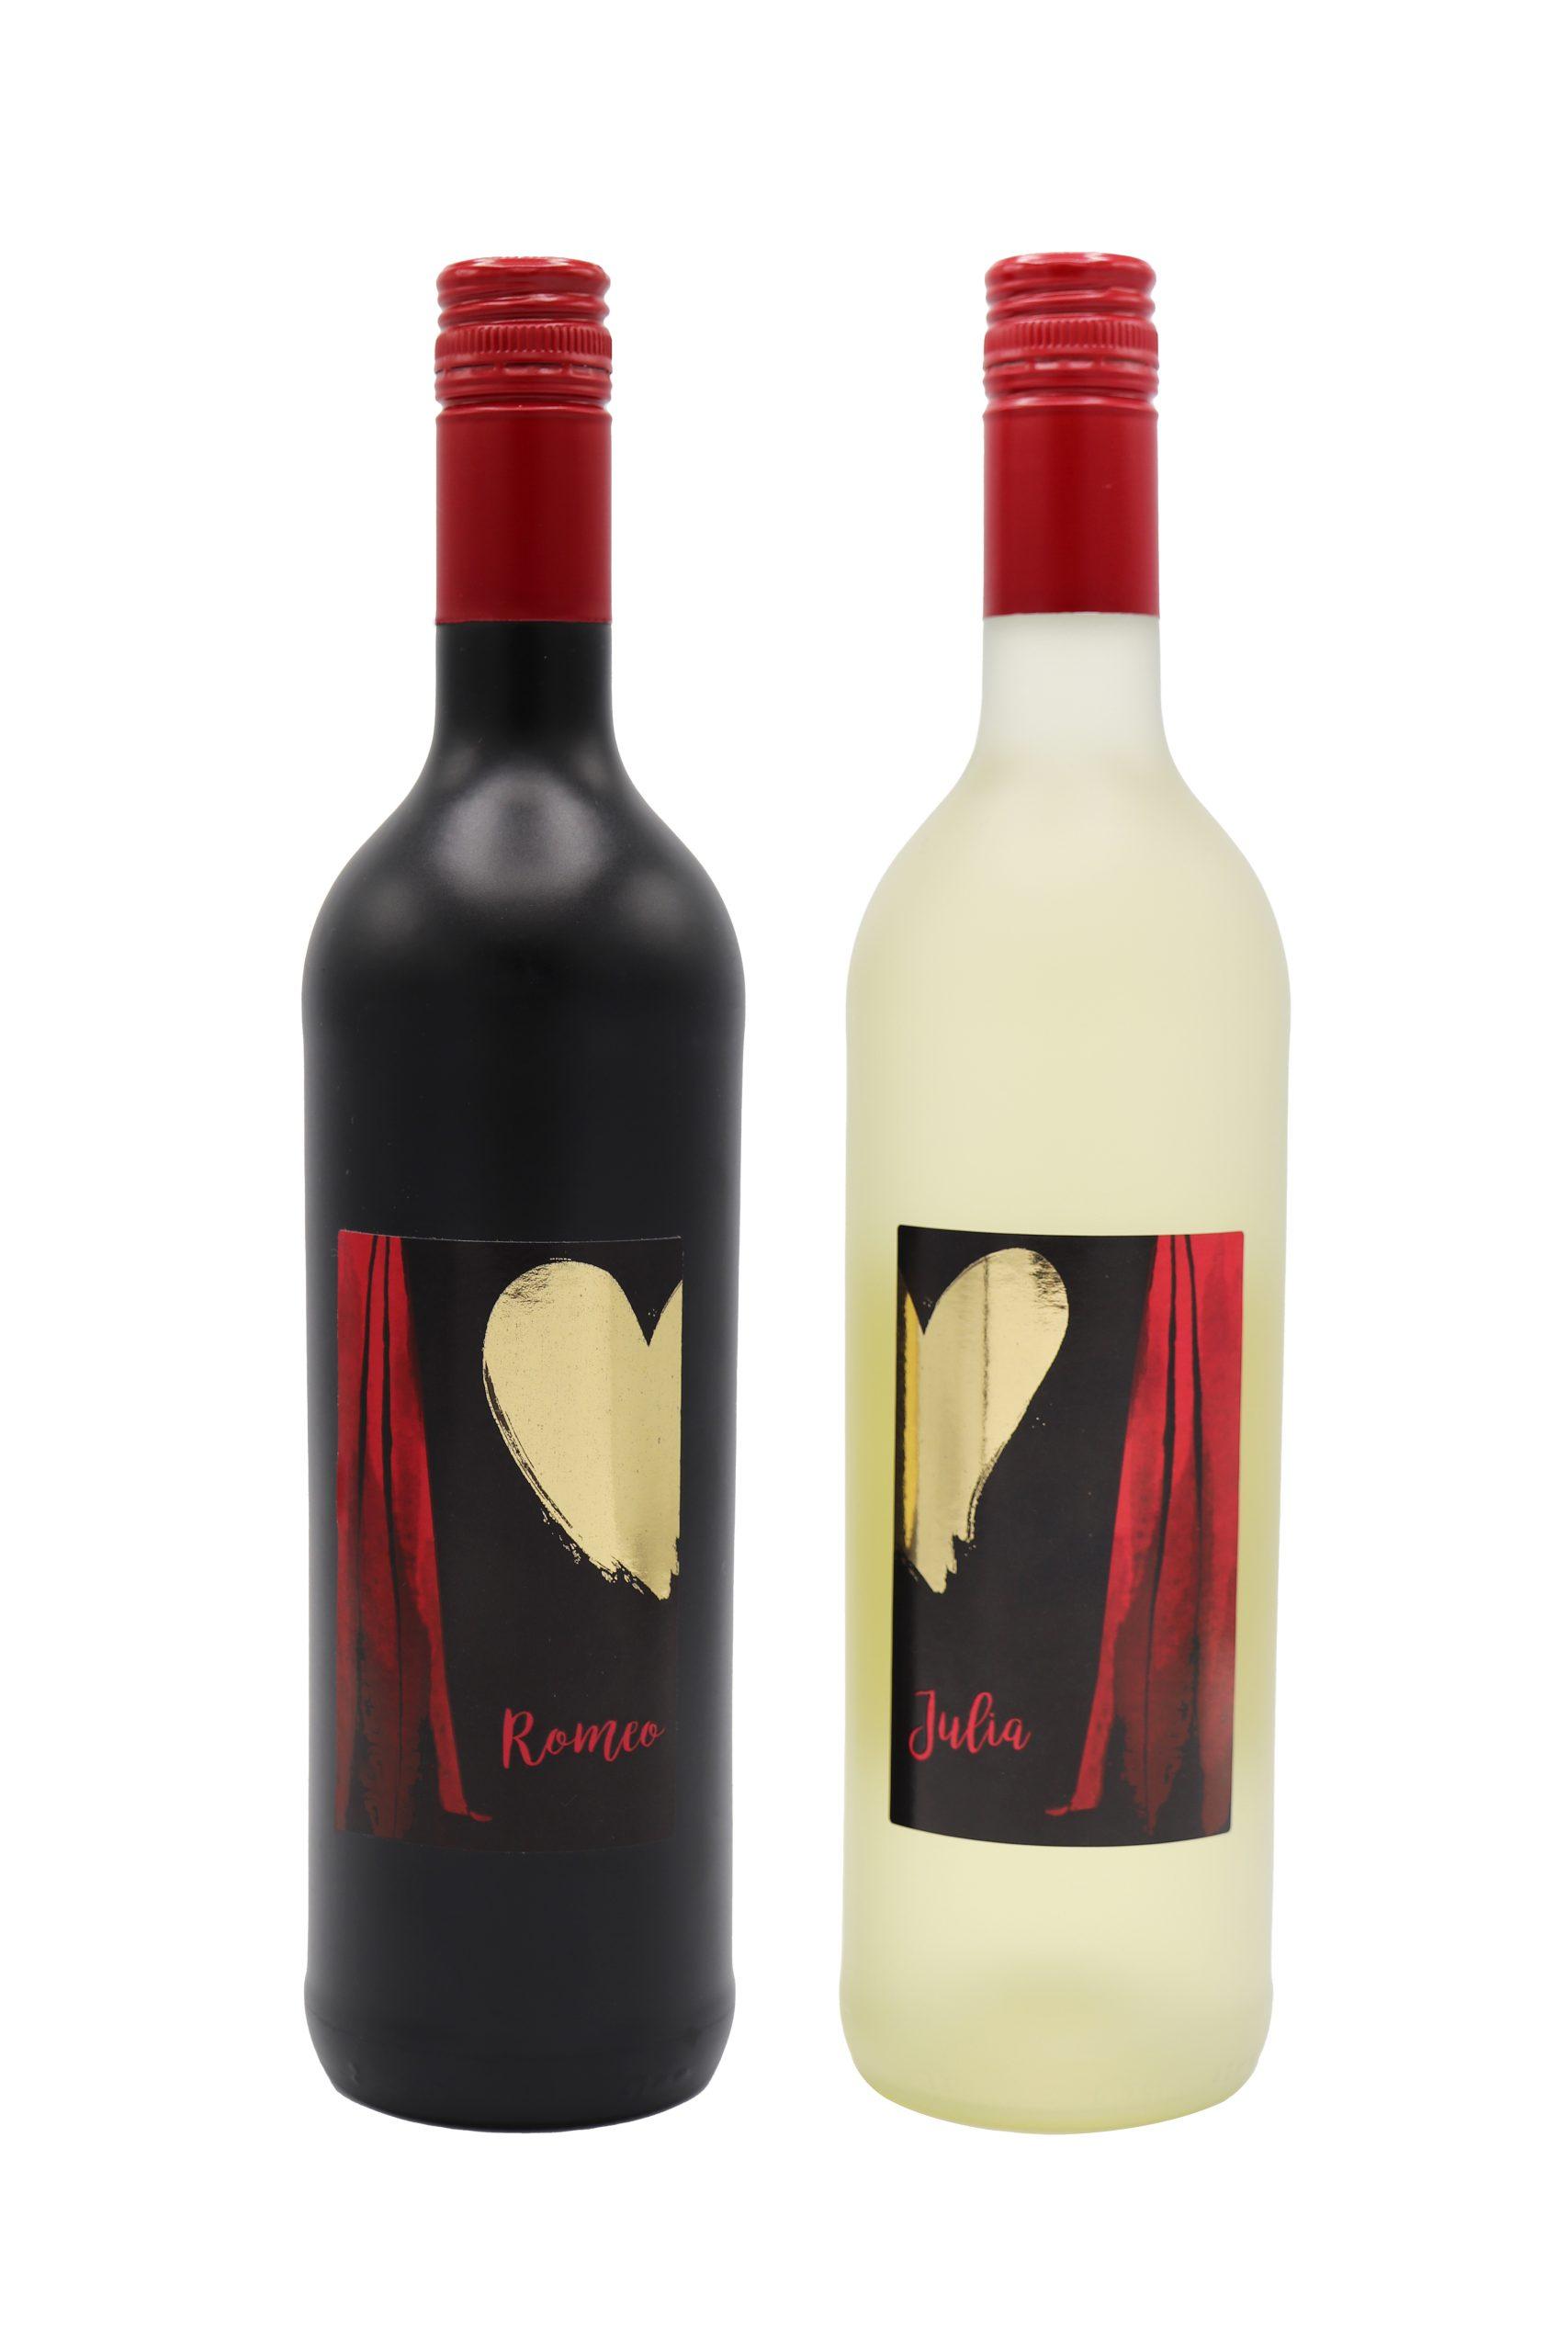 Württemberger Romeo Rotweincuvée Qualitätswein und Württemberger Julia Weissweincuvée Qualitätswein